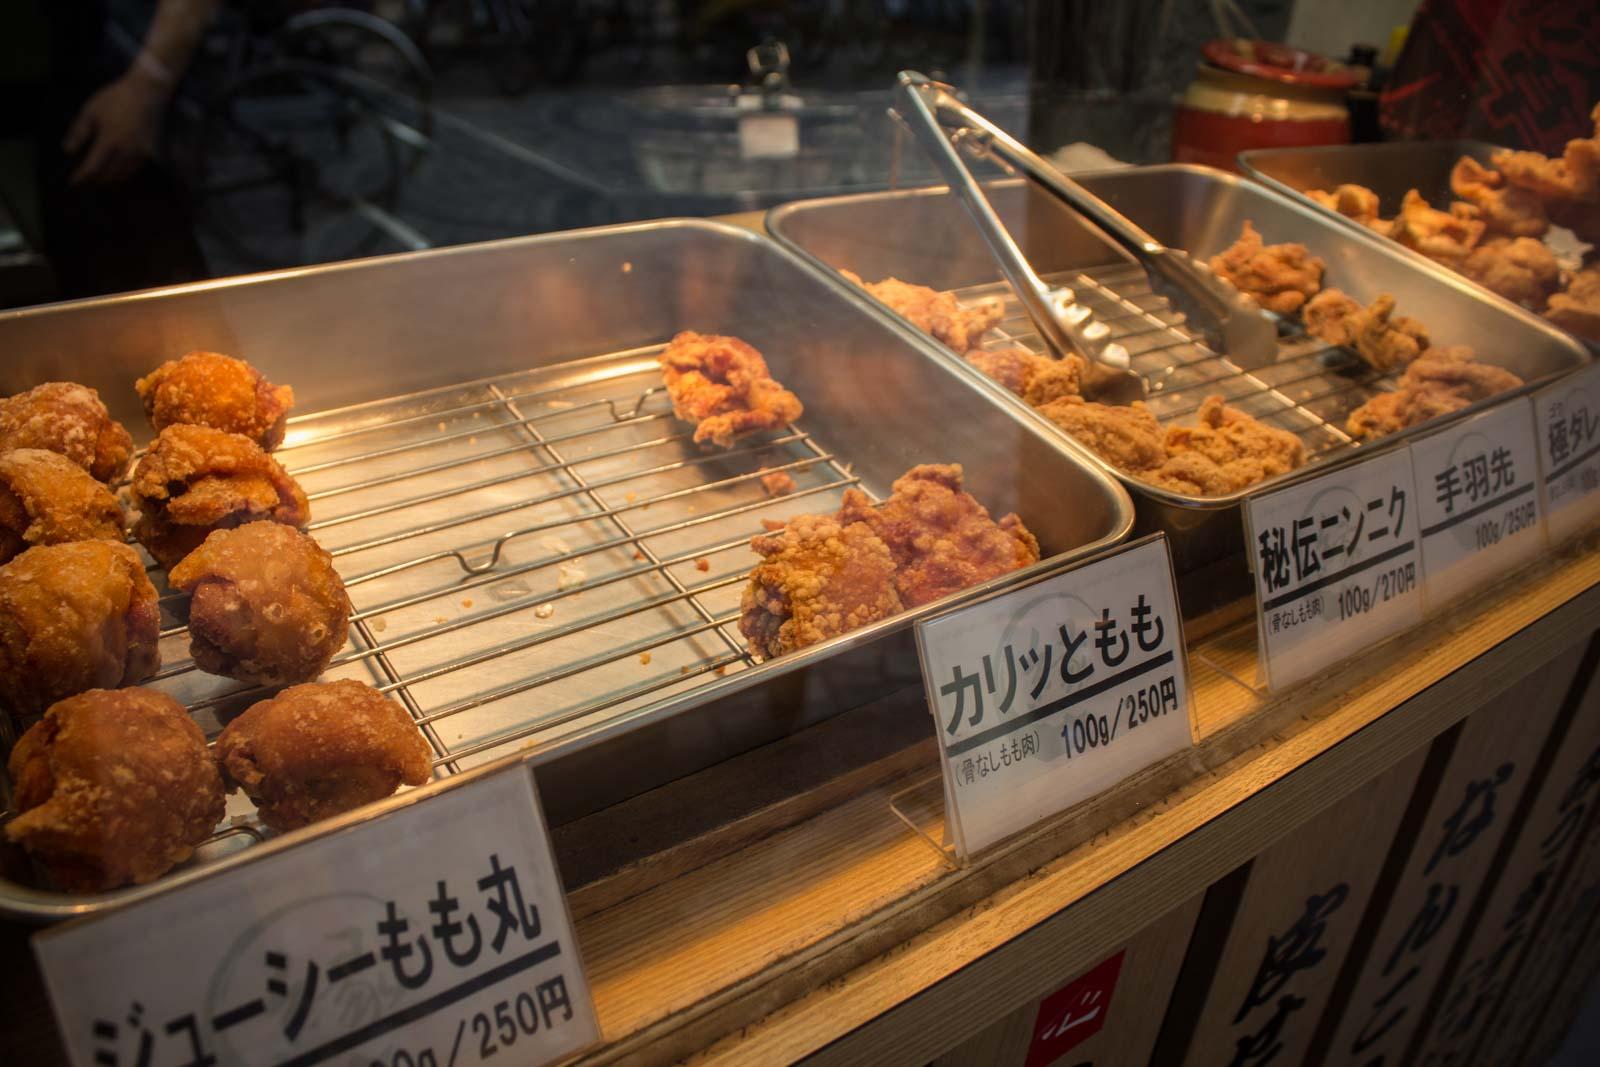 karaage, japanese food, japanese dishes, fried chicken in japan, fried japanese food